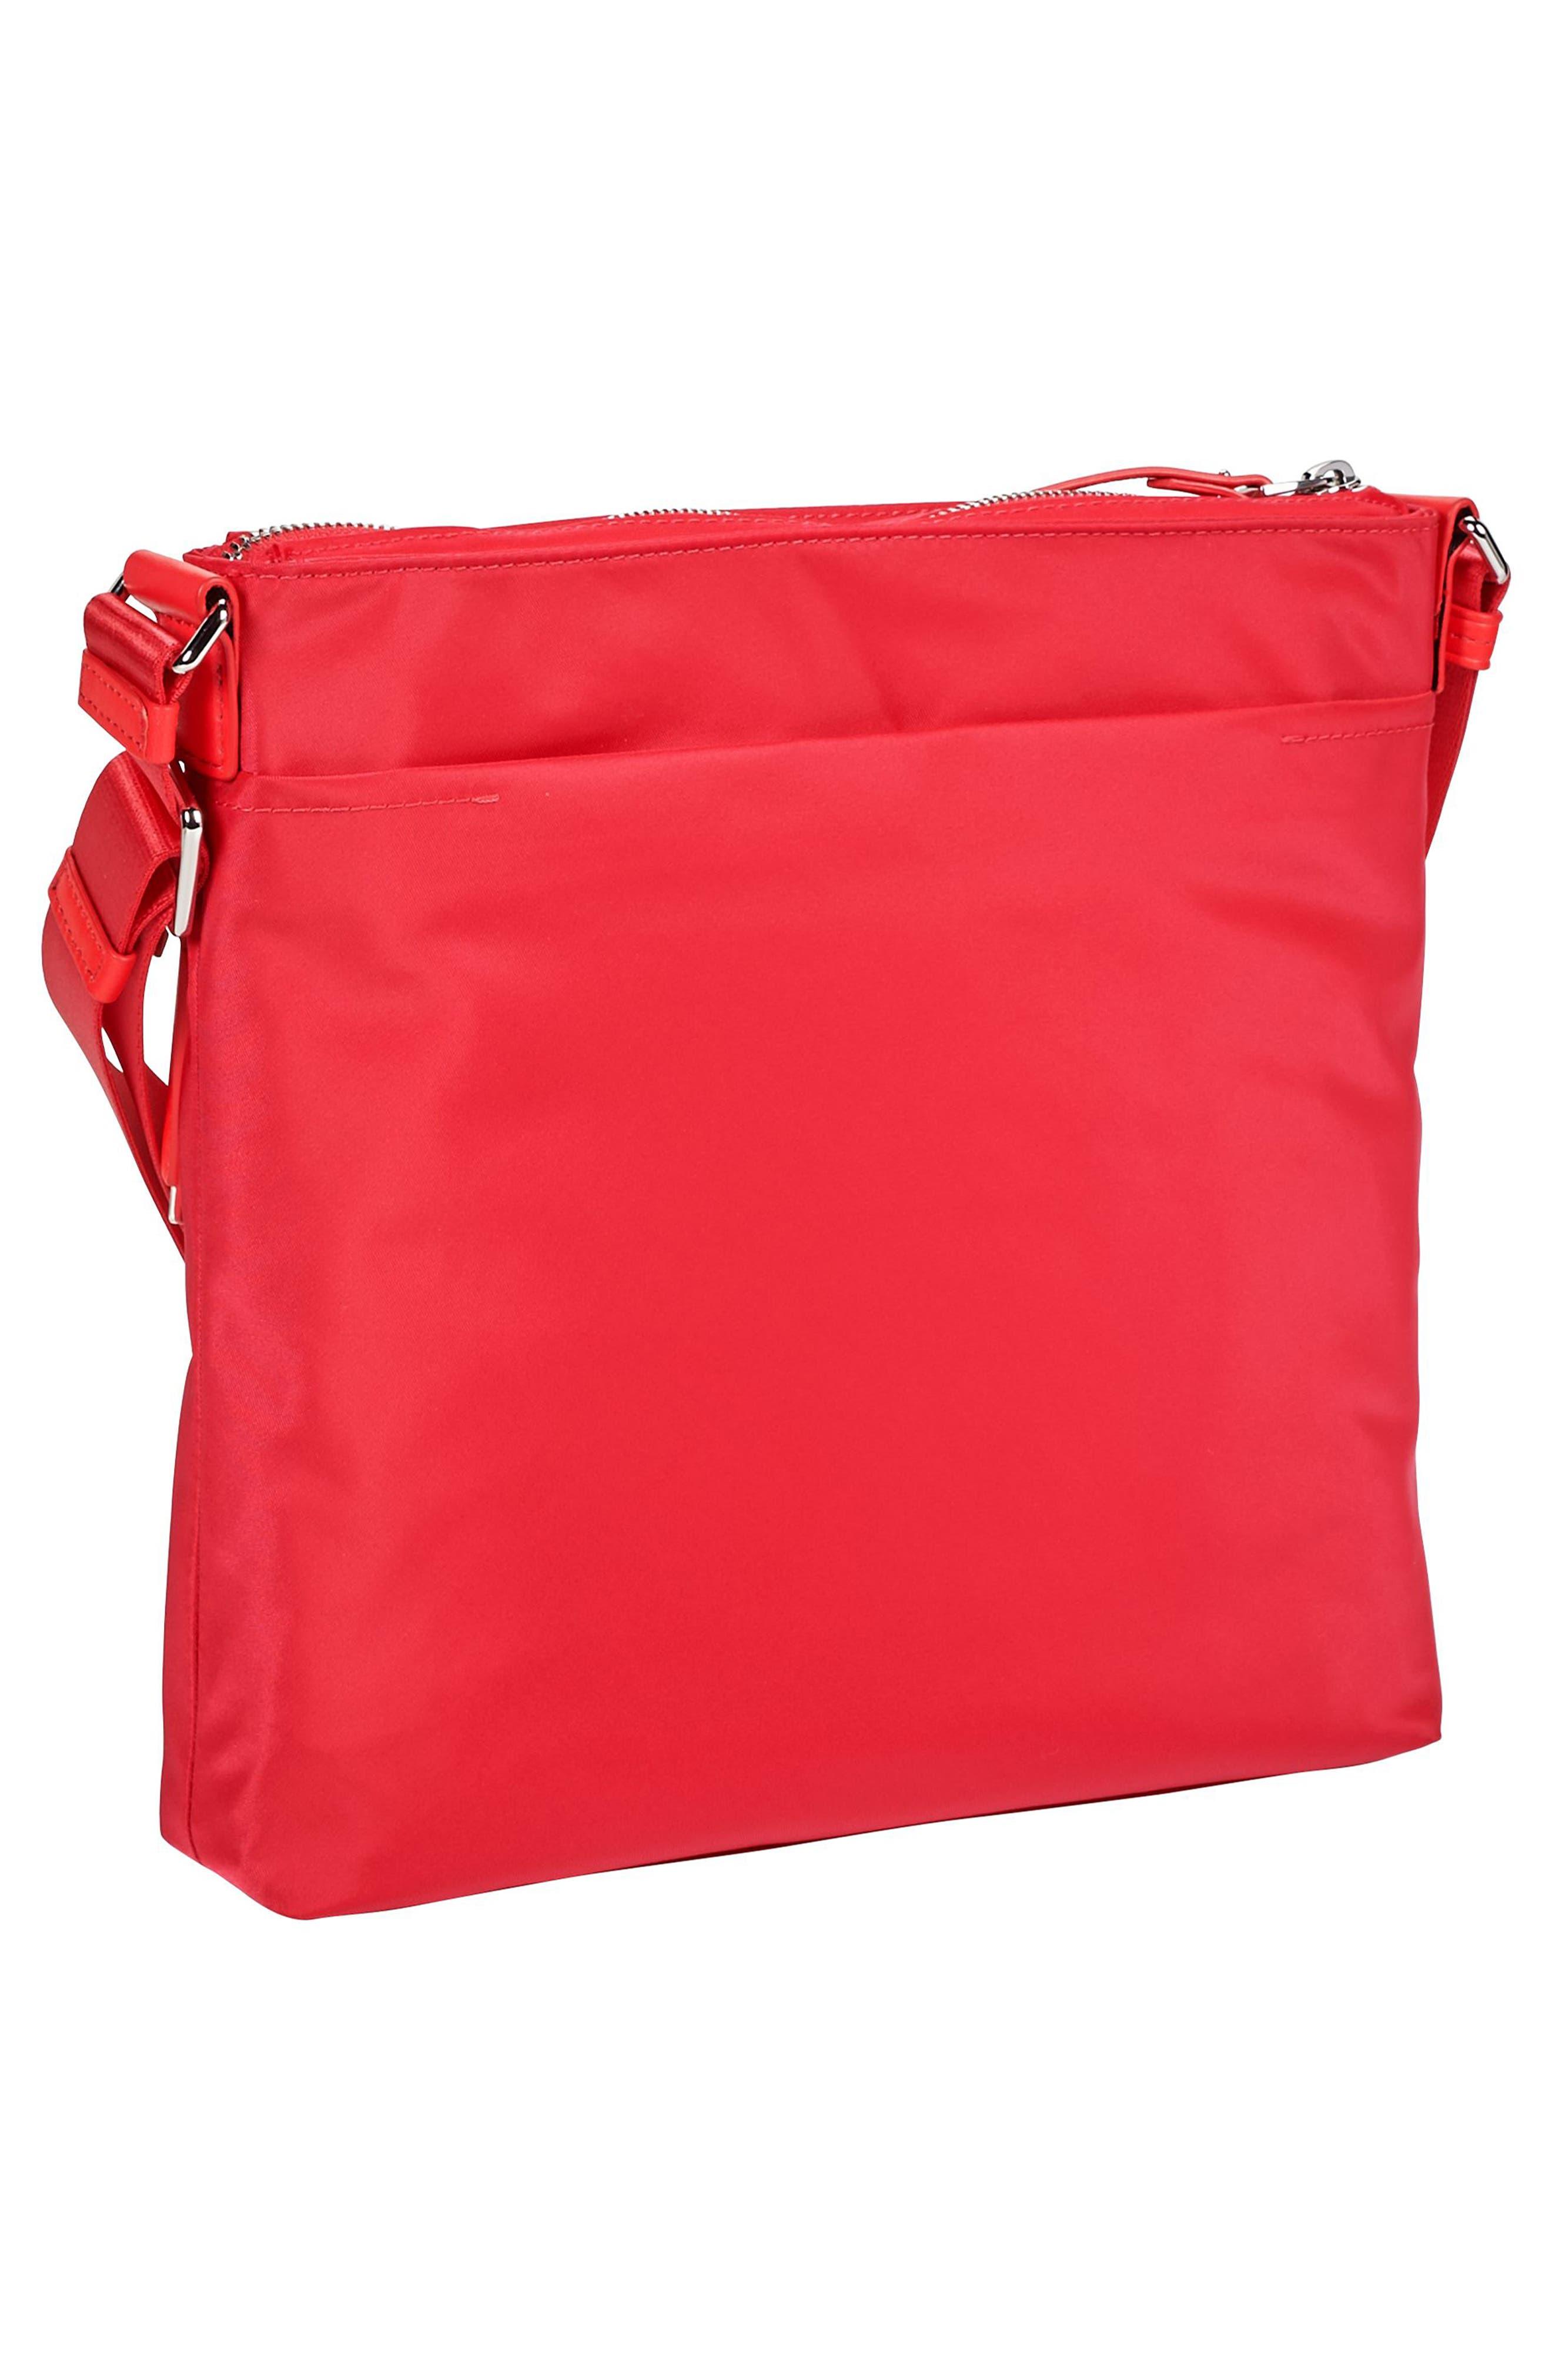 Voyageur - Capri Nylon Crossbody Bag,                             Alternate thumbnail 4, color,                             Hot Pink